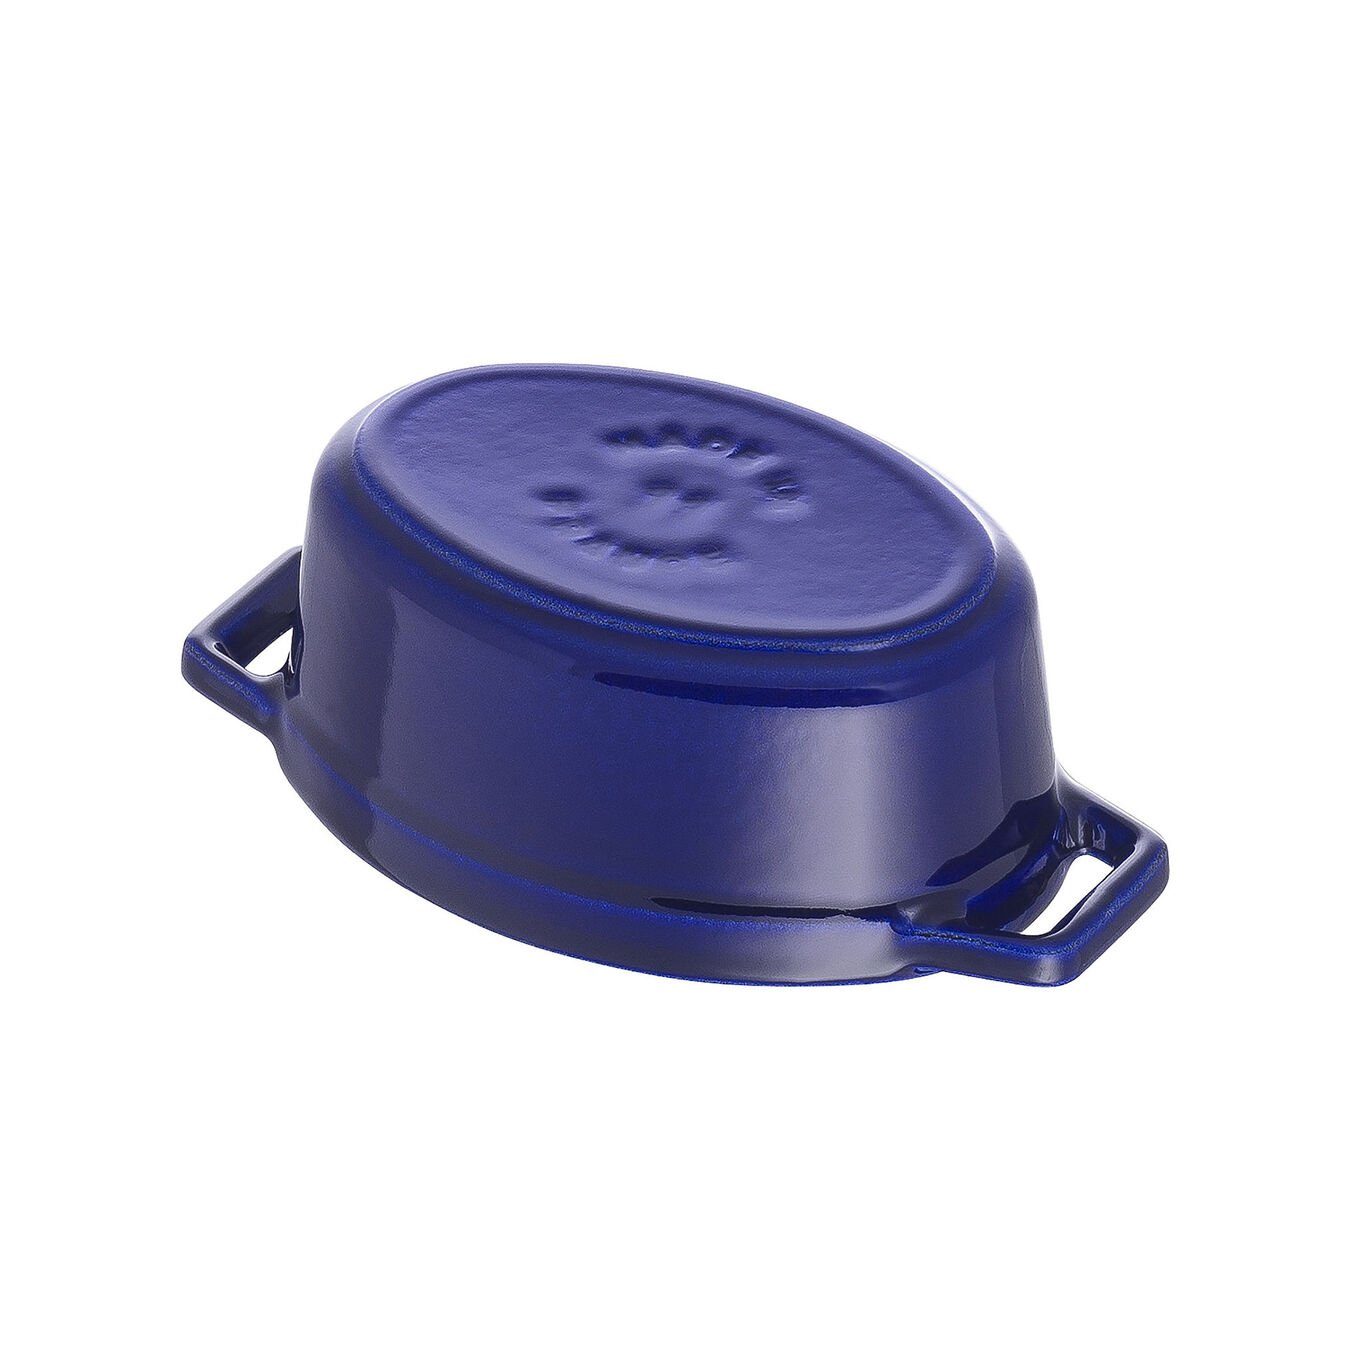 Mini Cocotte 11 cm, Ovale, Bleu intense, Fonte,,large 4